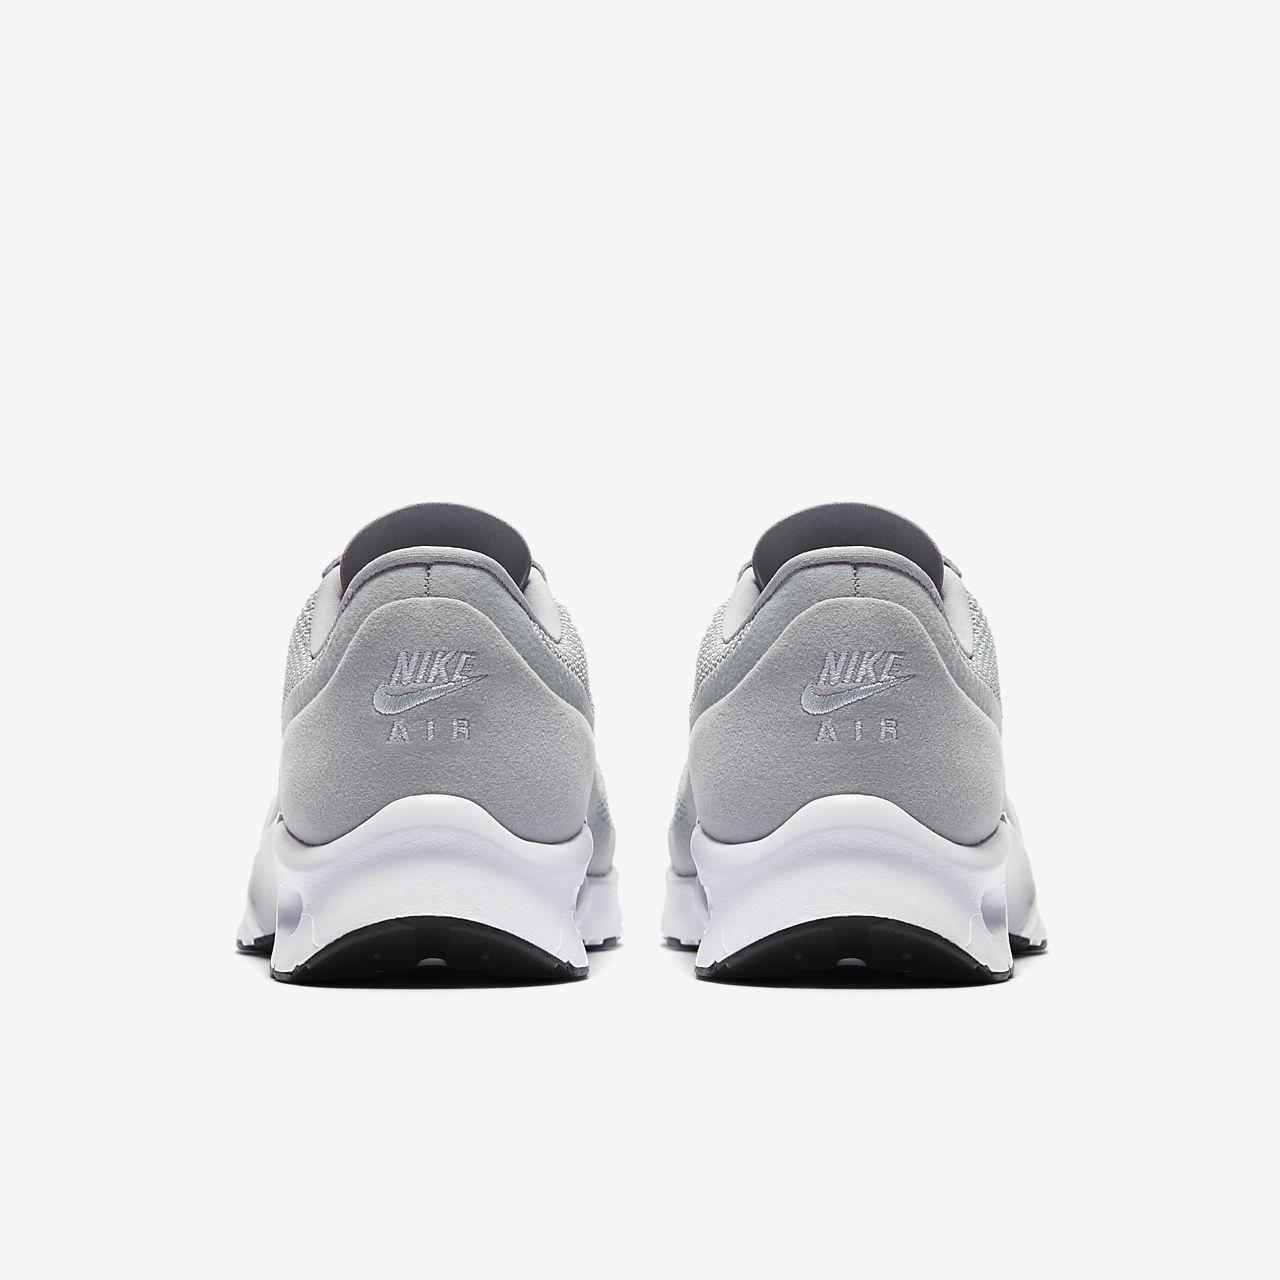 Freies Verschiffen Erkunden Verkauf Original Nike - Damen - W Nike Air Max Jewell Lea - Sneaker - weiß Professionelle Günstig Online Rabatt Aaa Auslass Verkauf kndNNXxKOU